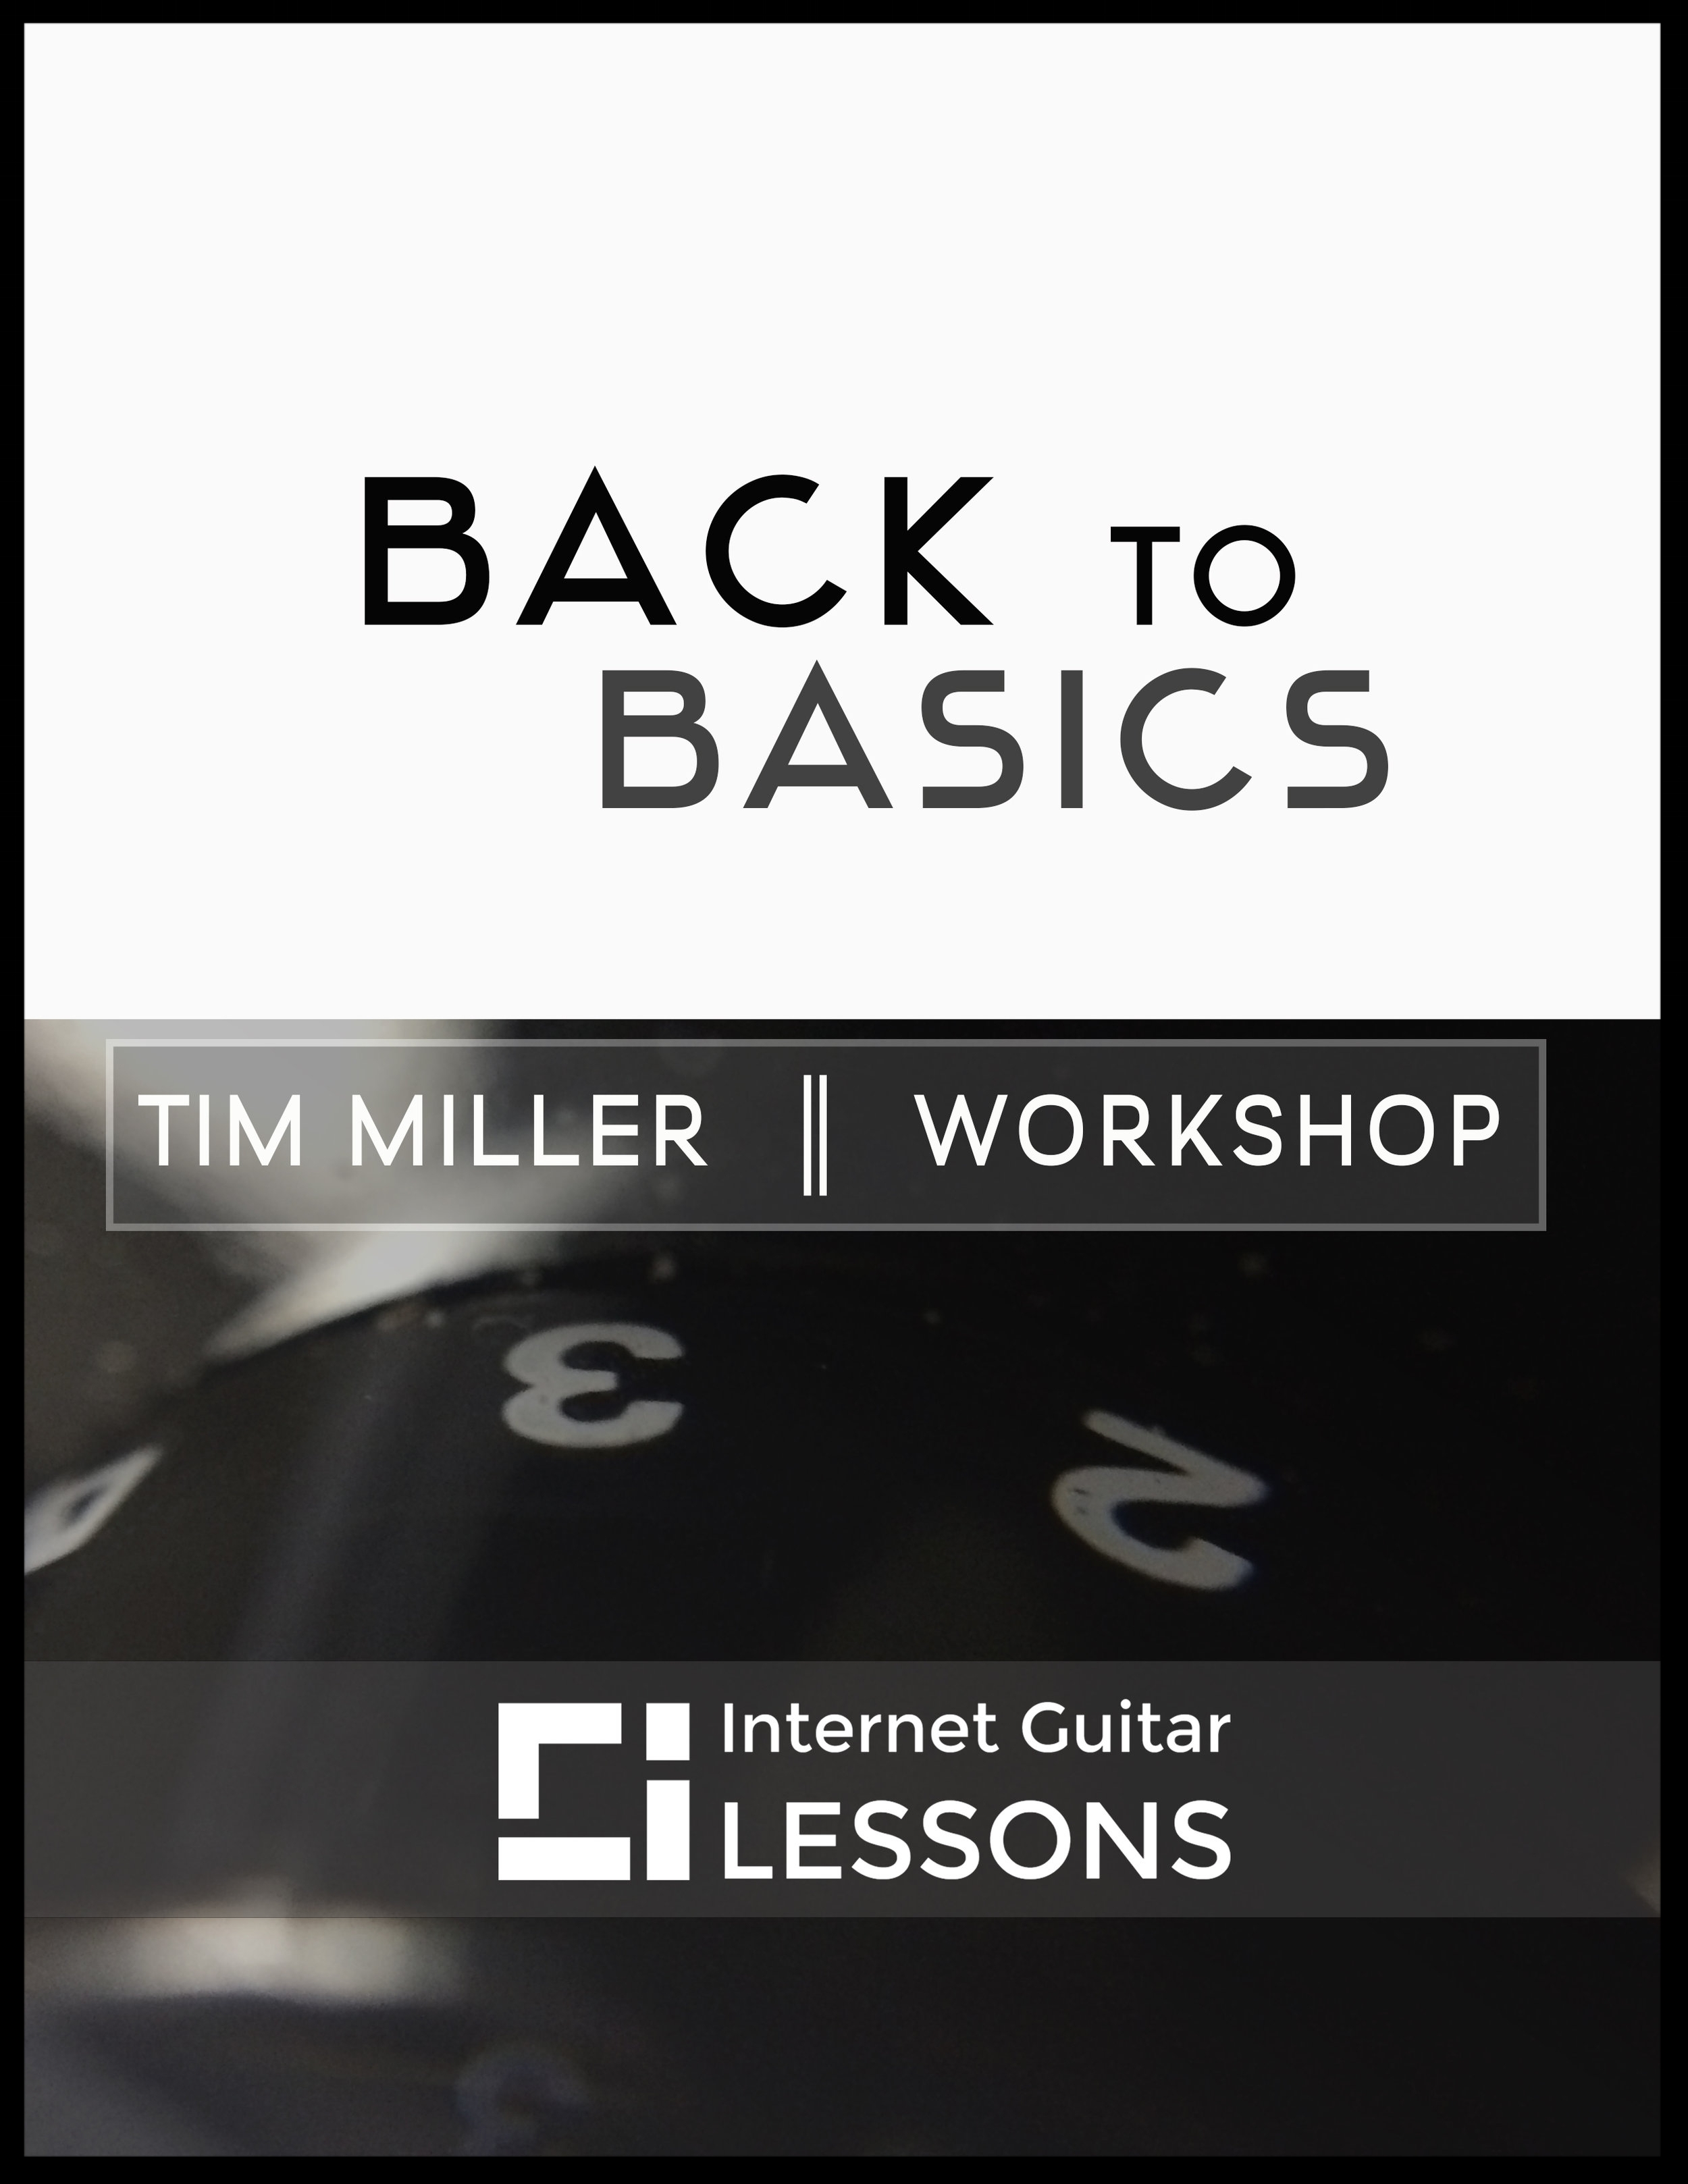 Back to Basics 1.17 flat.jpg